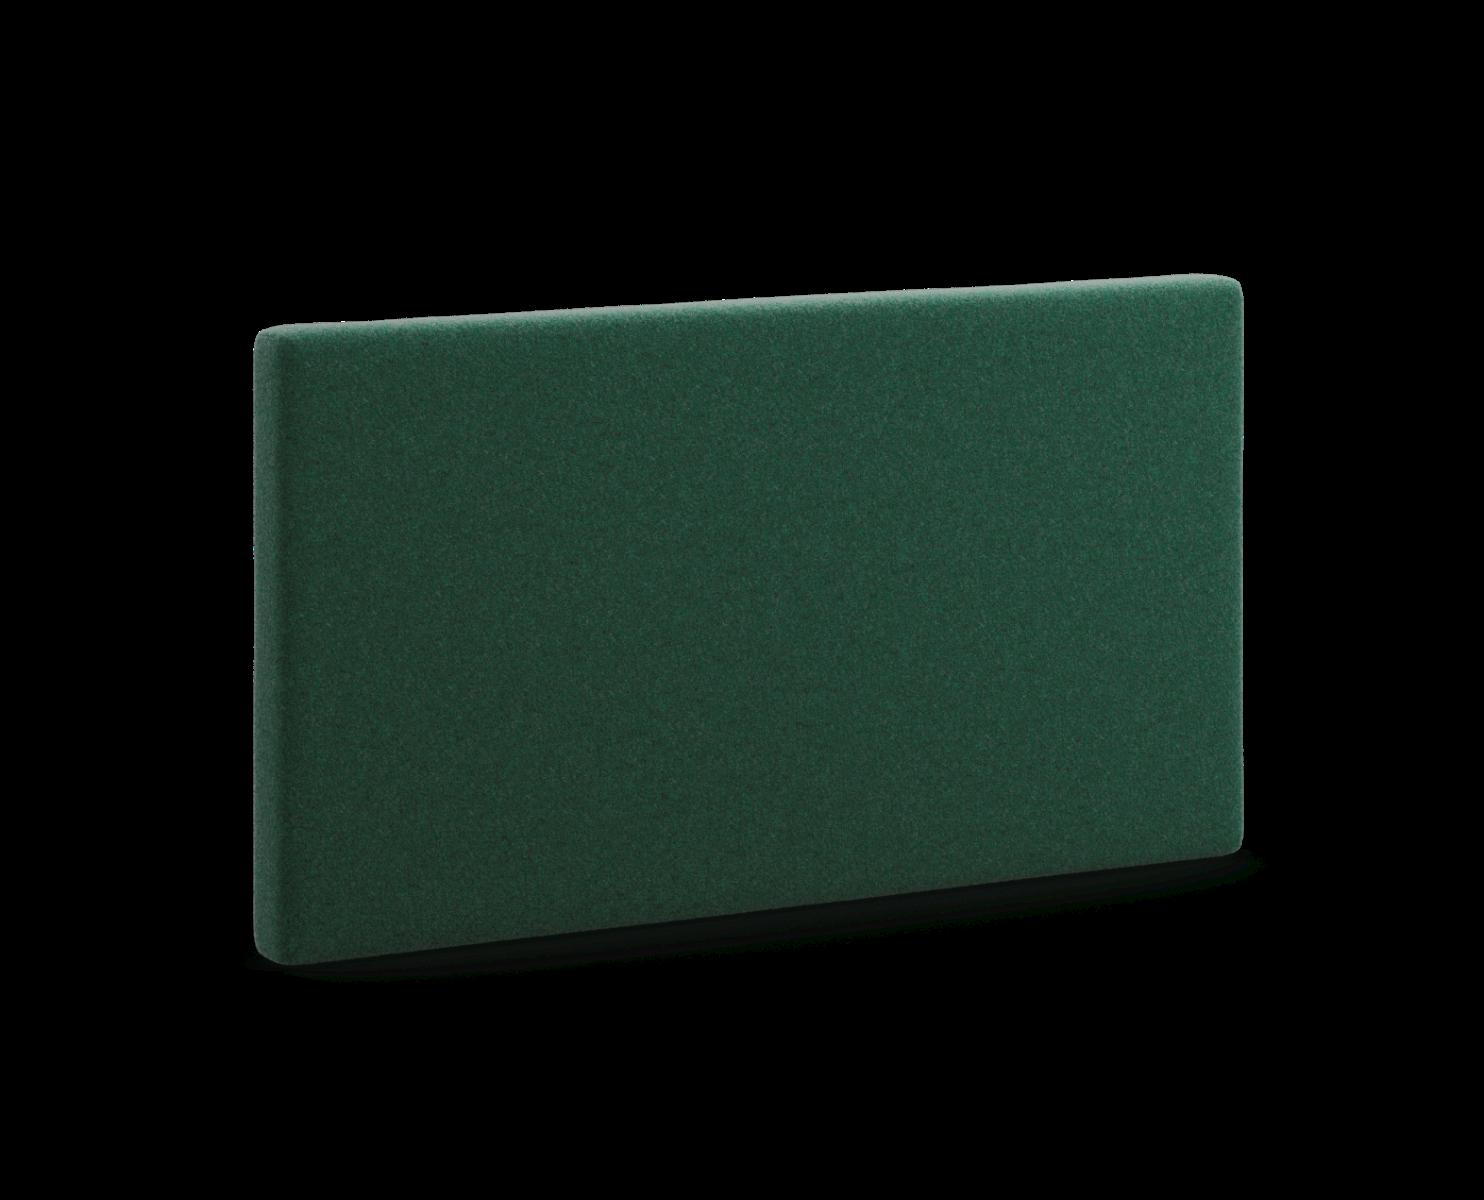 Køb Ovia Væghængt - 180x108x8 Grønn